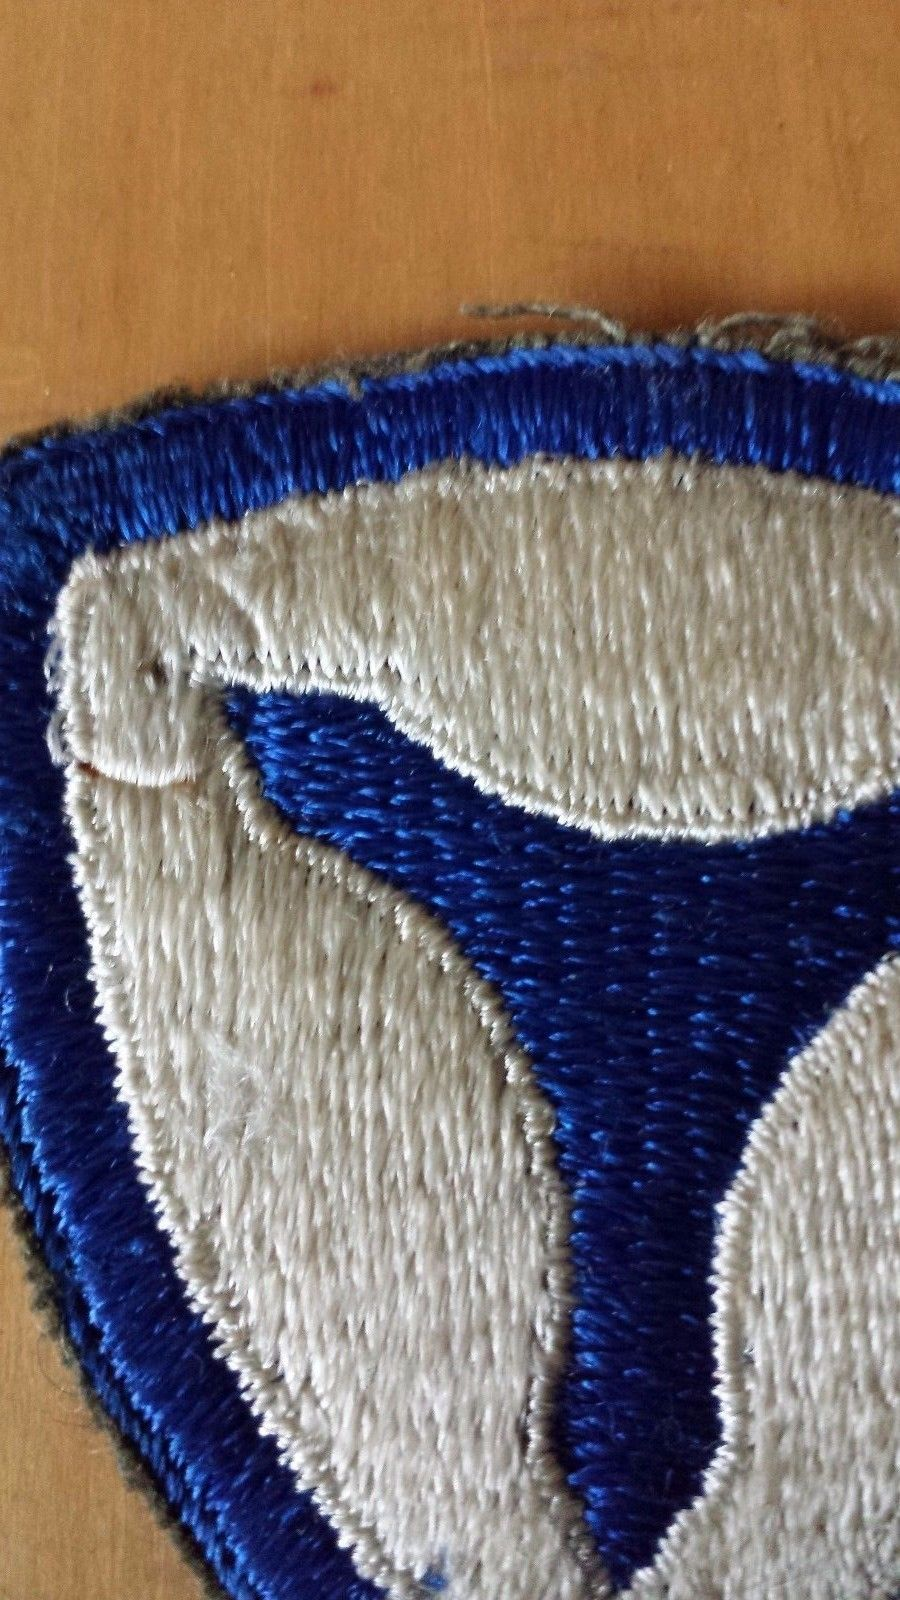 VTG Blue White Military Patch Triangle Emblem